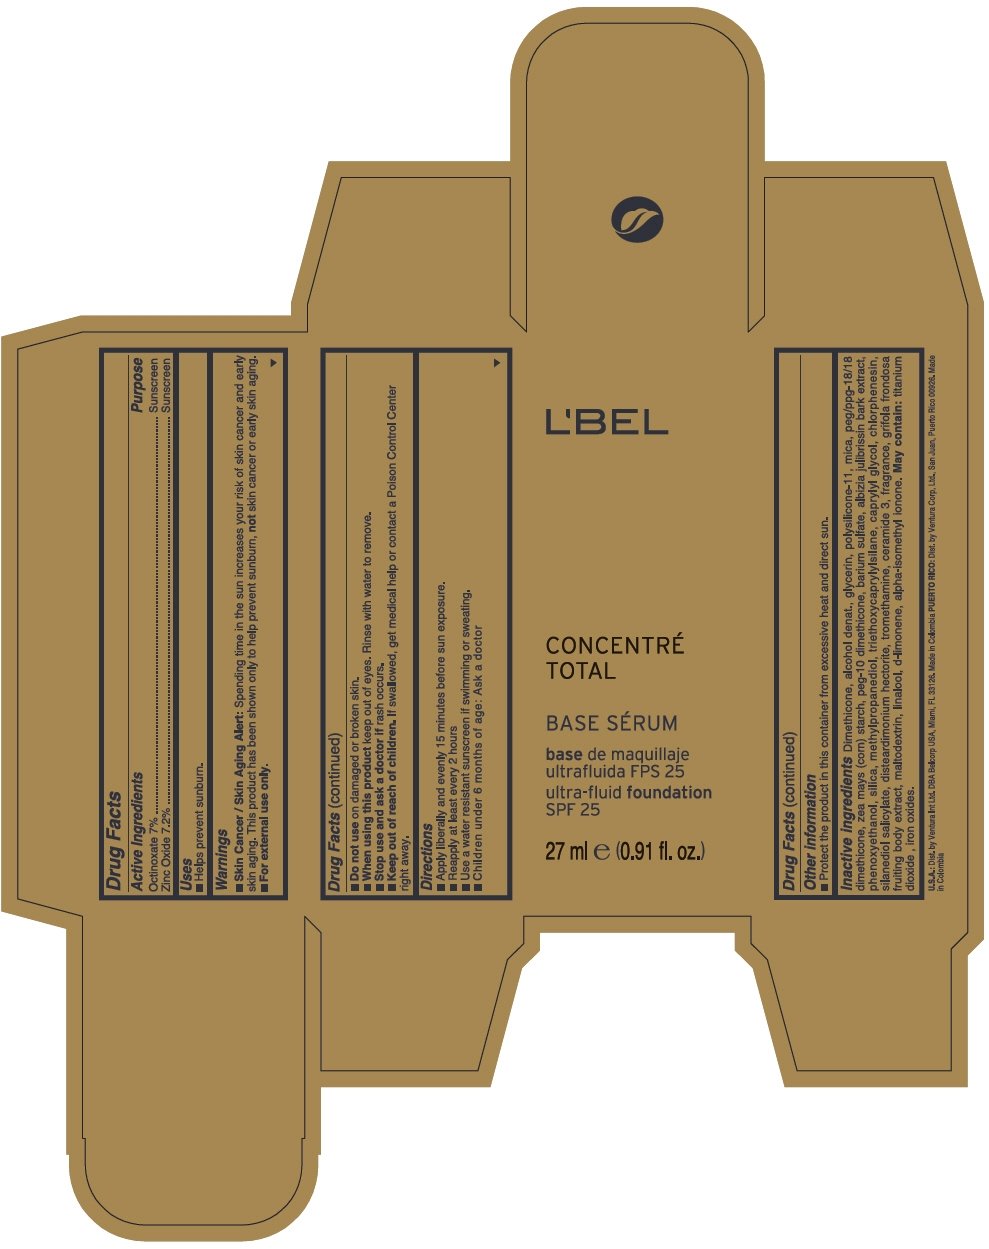 PRINCIPAL DISPLAY PANEL - 27 ml Tube Box - OBSCURE 9 - BEIGE